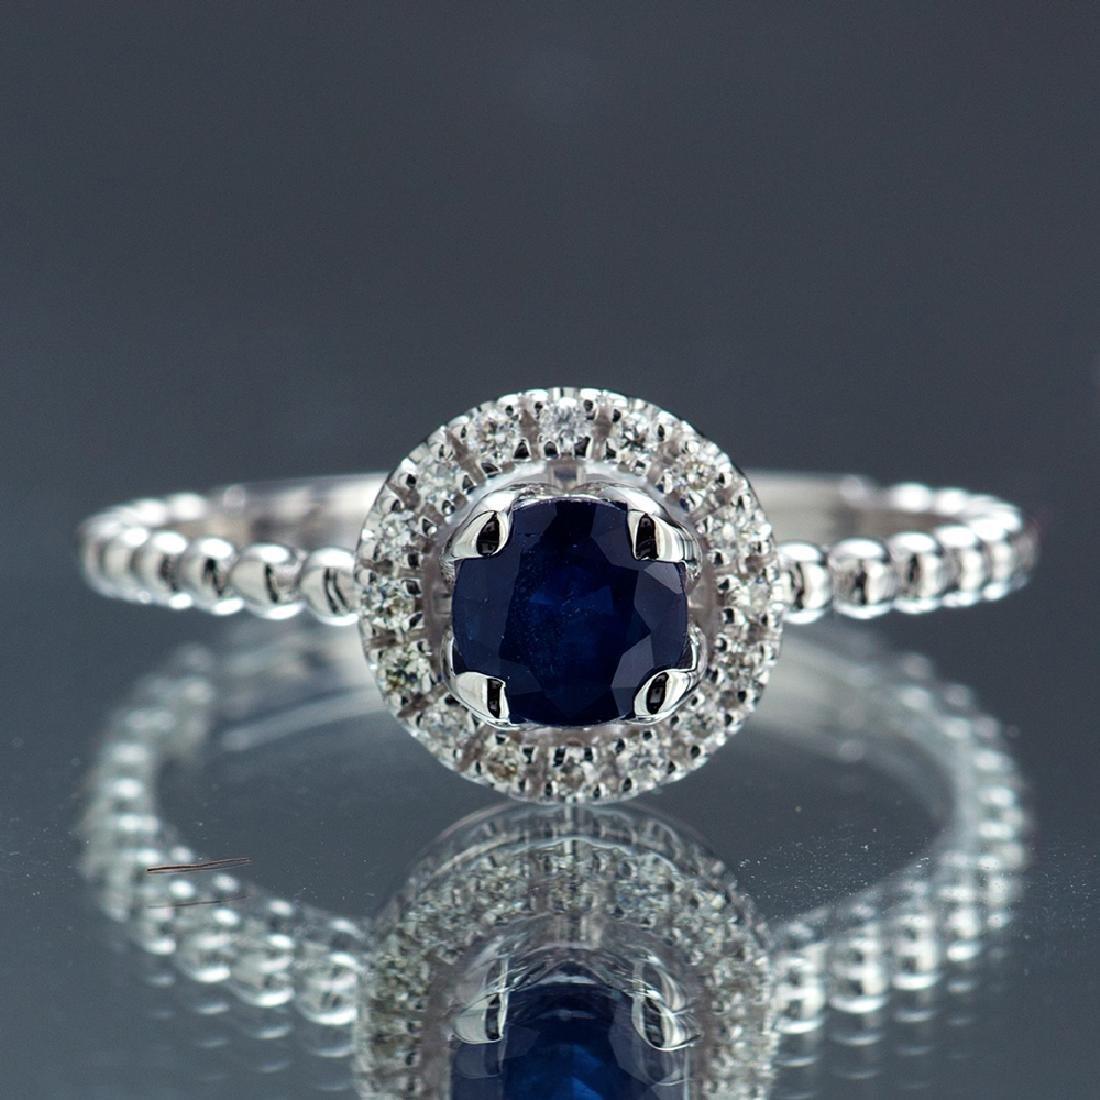 *Fine Jewelry 14KT White Gold, 0.64CT Round Brilliant